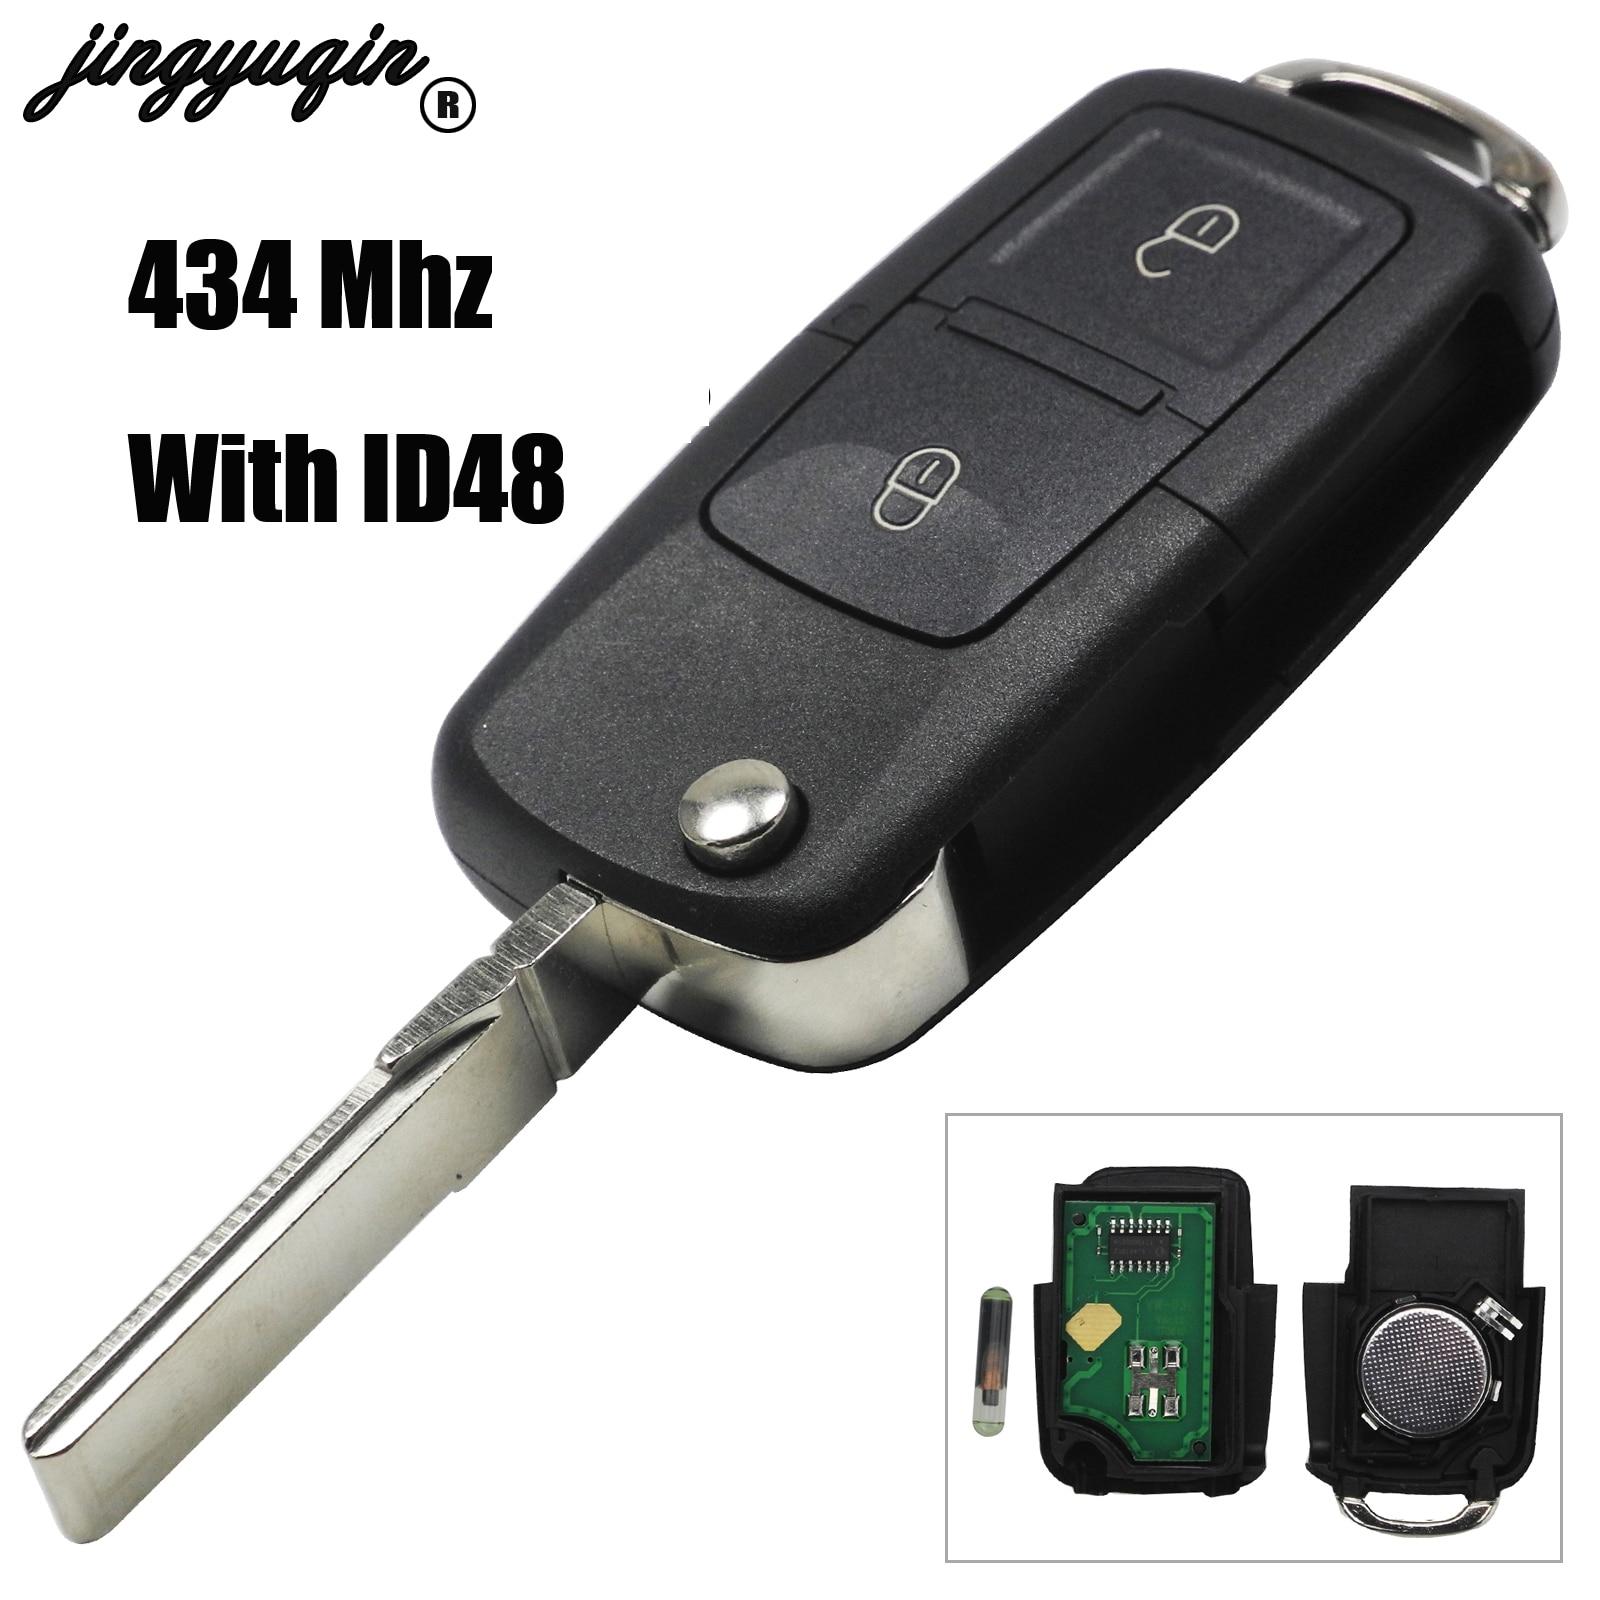 Пульт дистанционного управления jingyuqin 2/3/4, брелок с чипом ID48 434 МГц для VW SEAT Altea/Ibiza/Leon/Toledo T5 1J0 959 753 AG